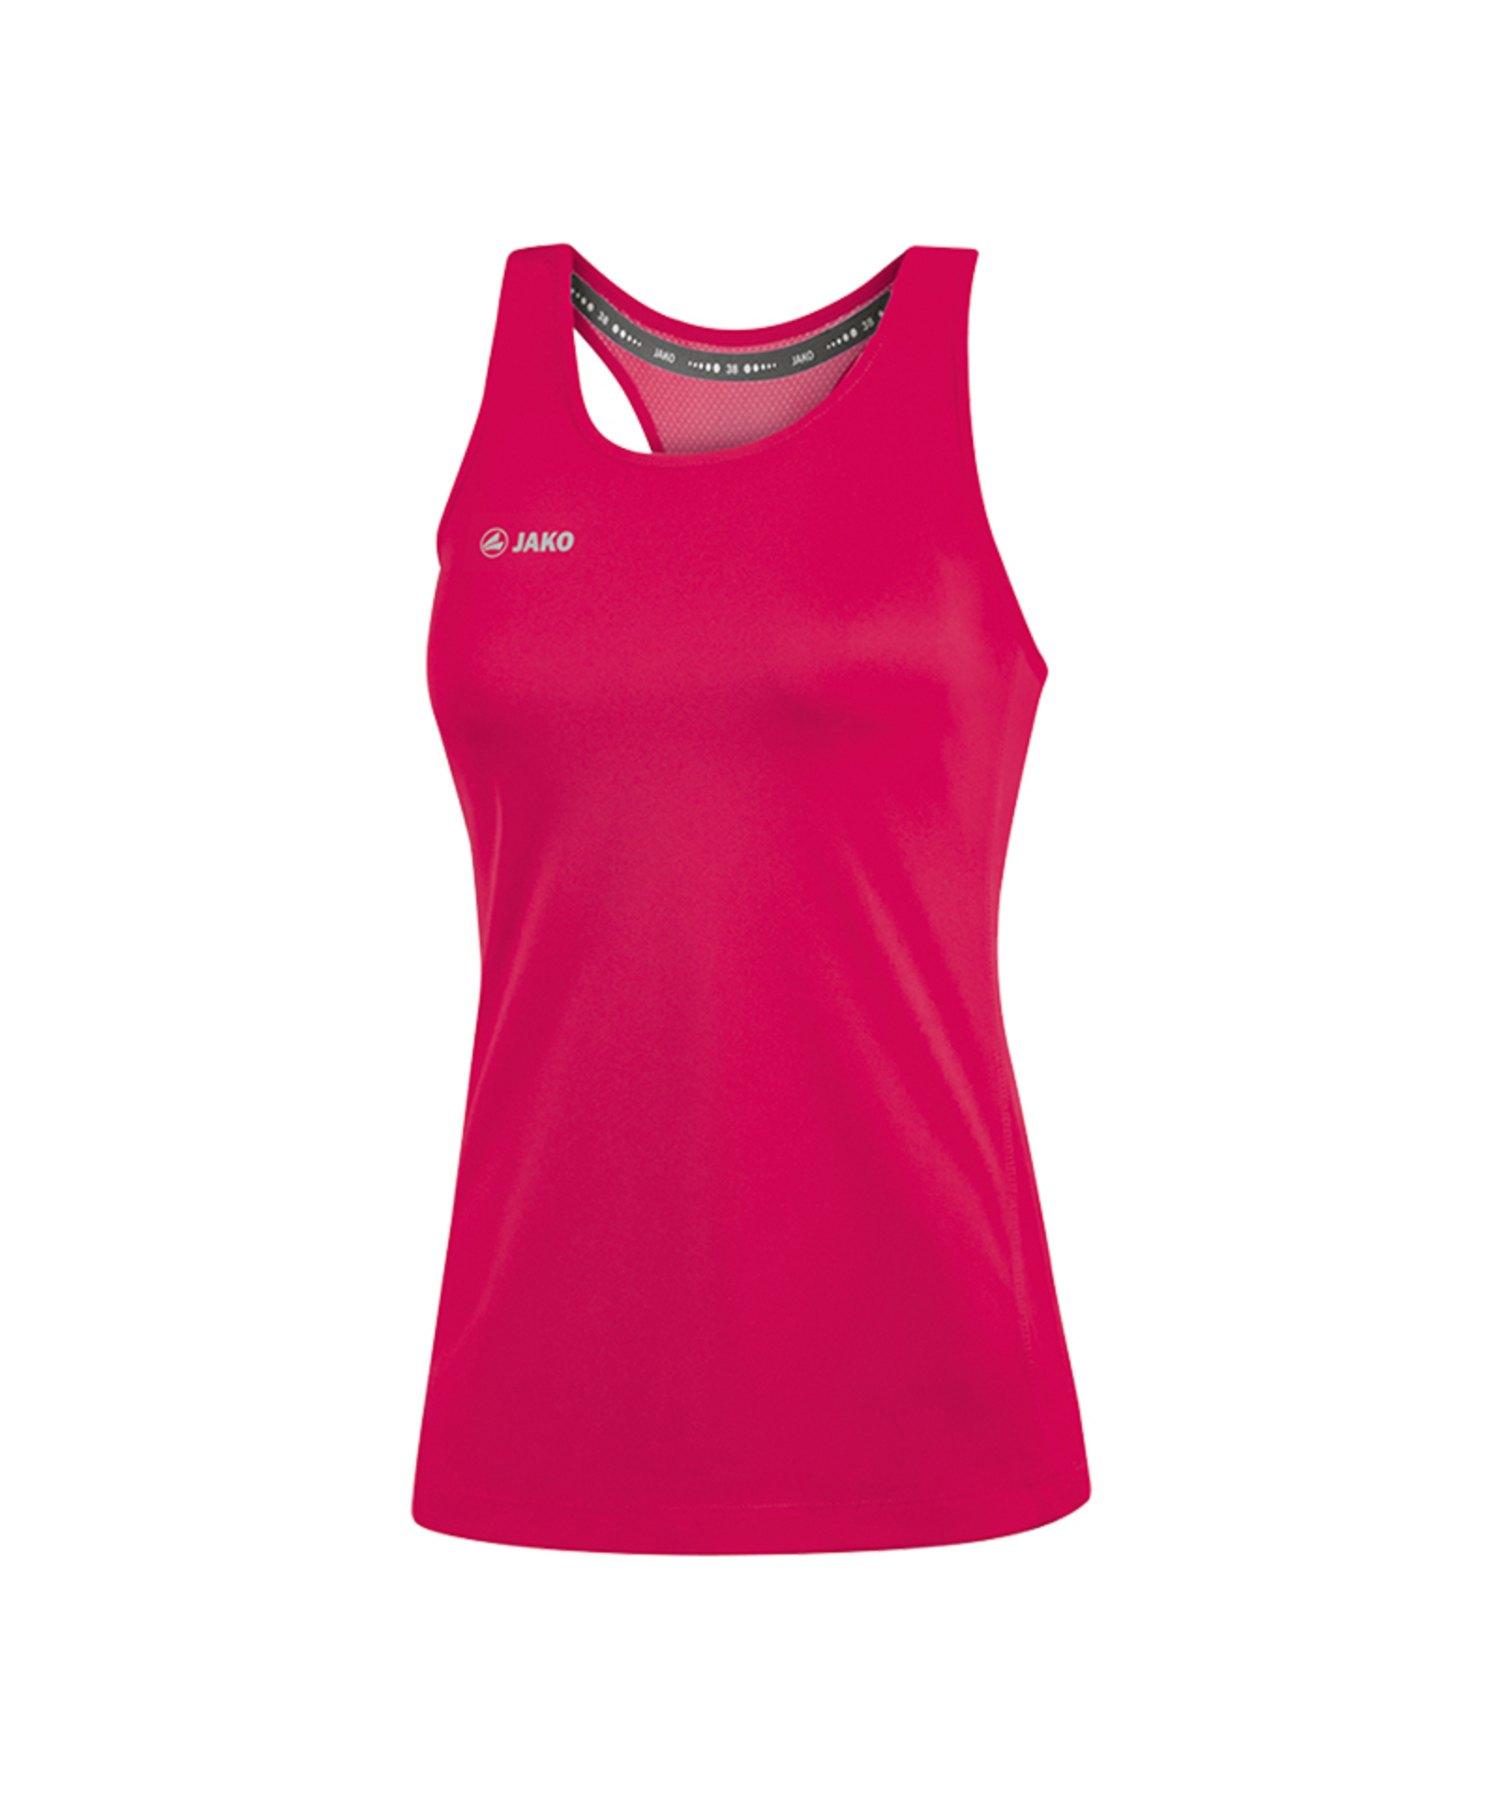 Jako Run 2.0 Tanktop Running Damen Pink F51 - Pink